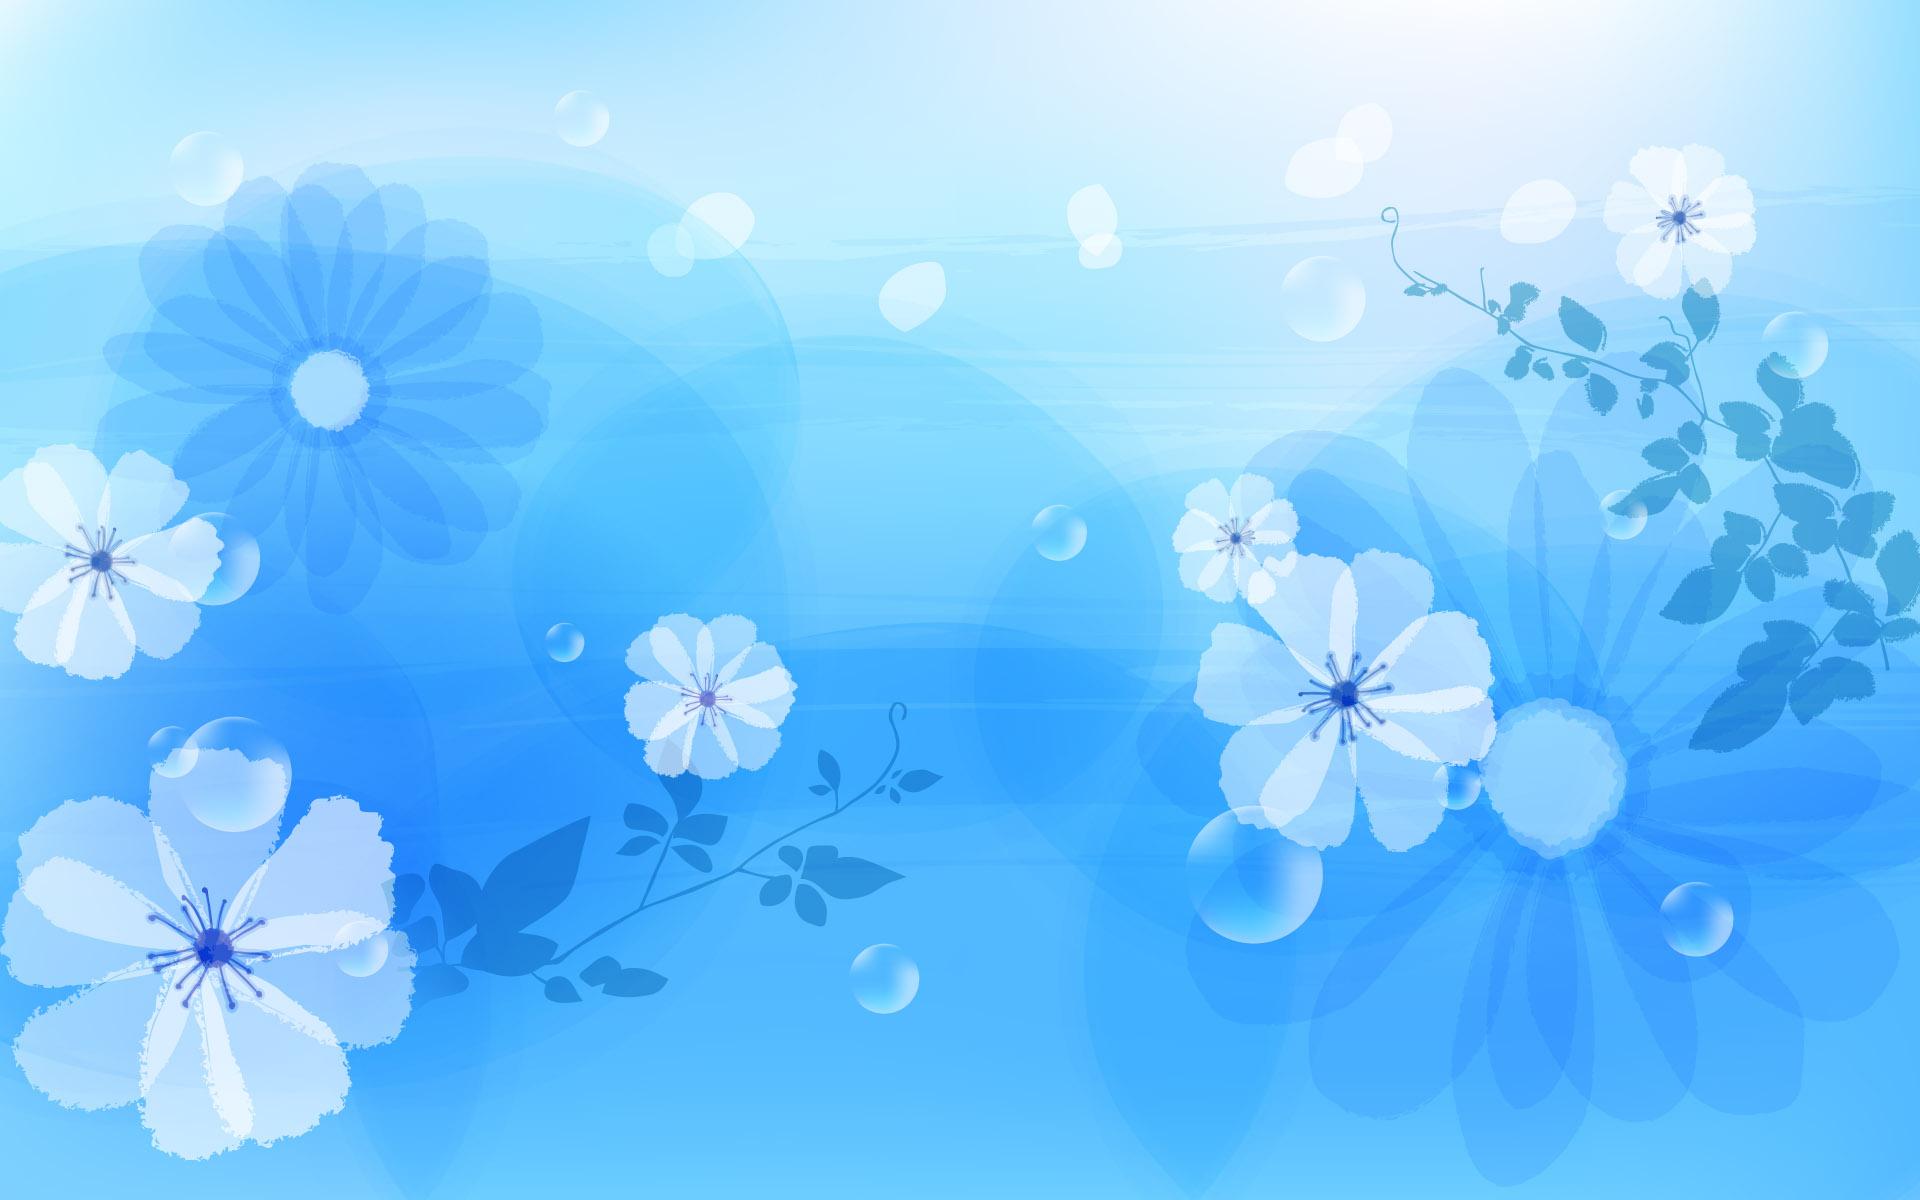 Flower Design Wallpaper 6985 Hd Wallpapers in Vector n Designs 1920x1200